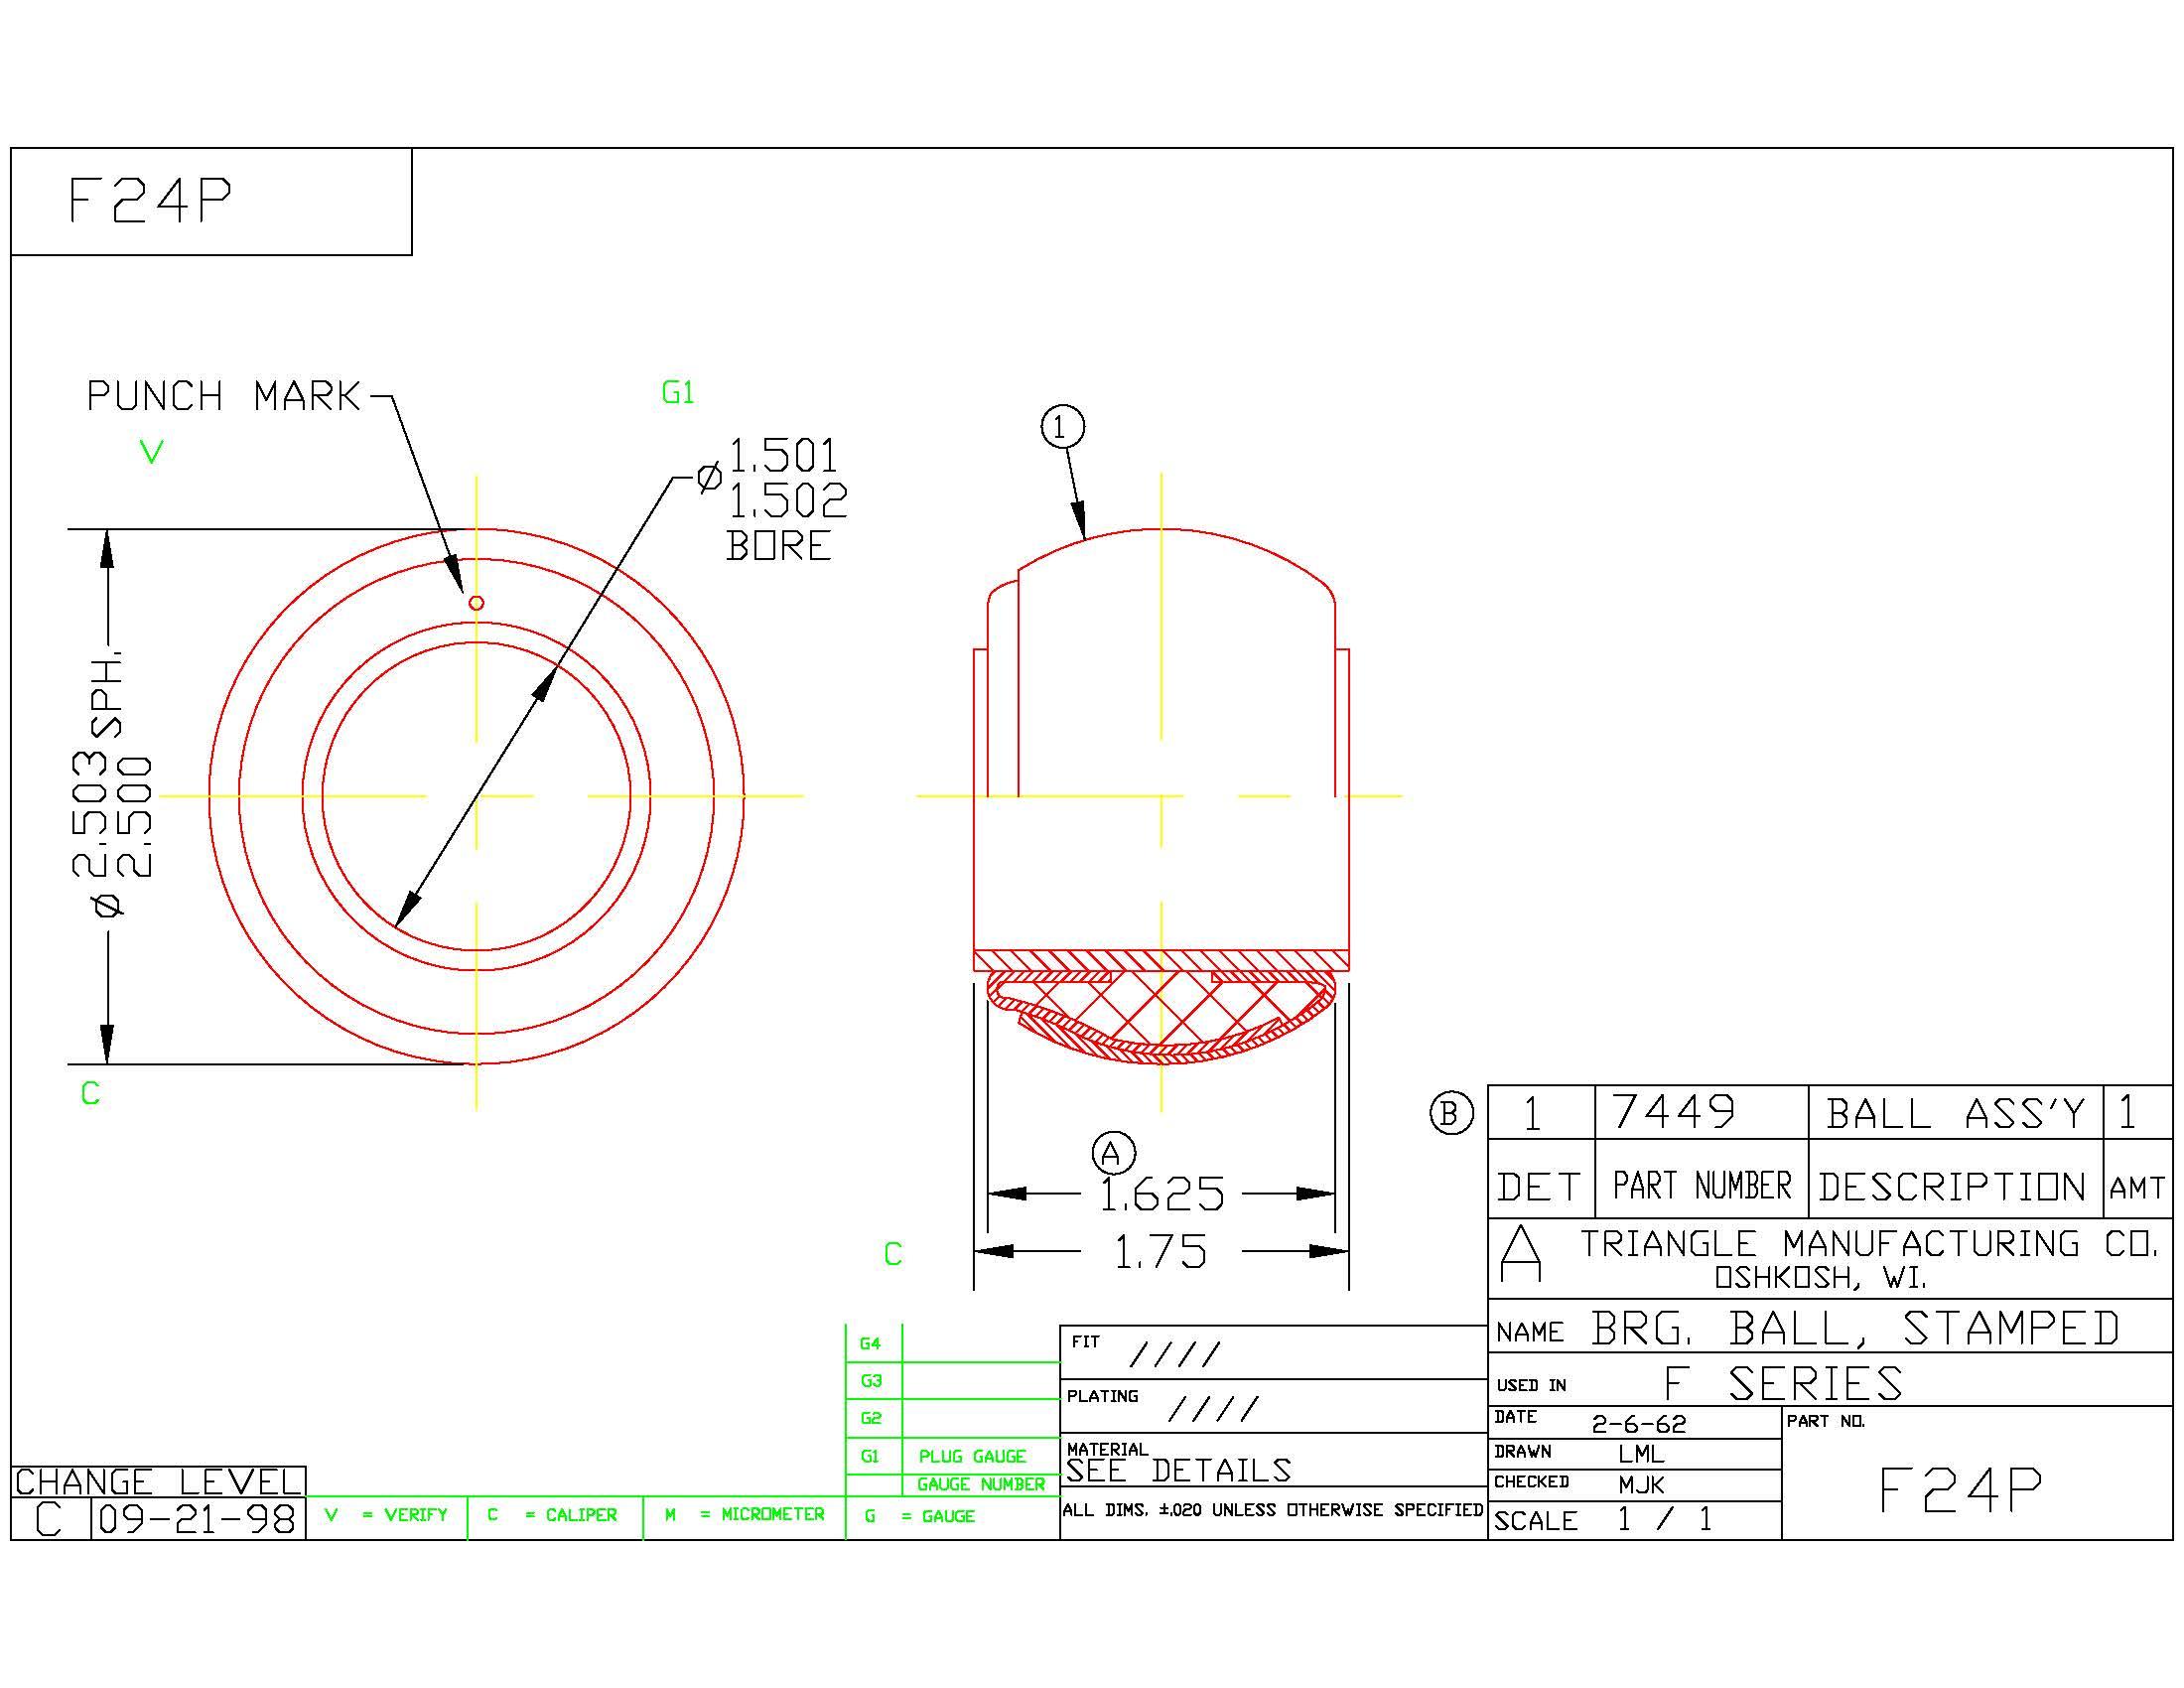 Spherical Plain Bearing F24P